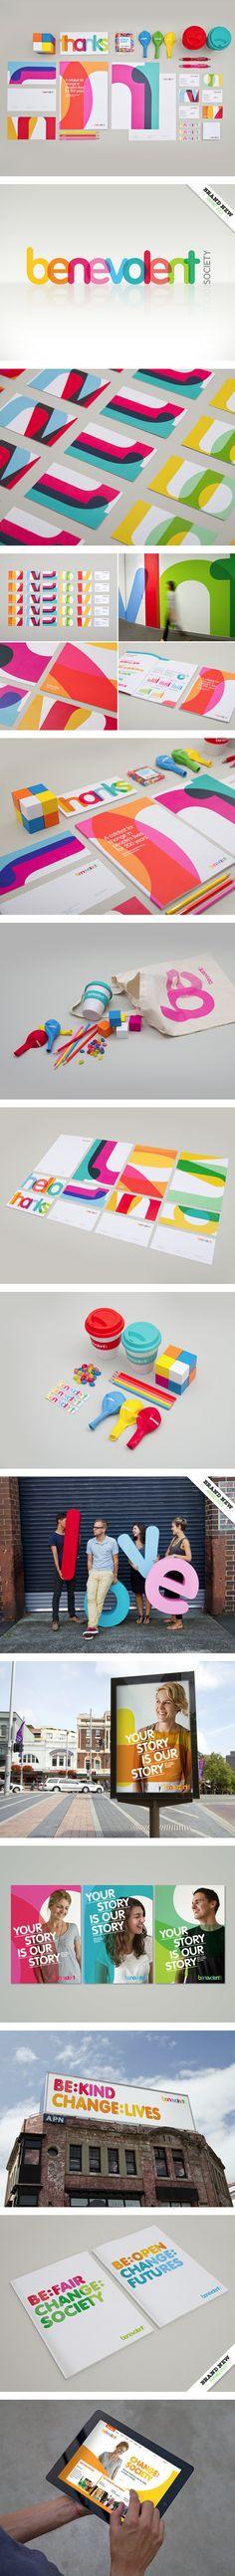 Benevolent Society stationary. #design #graphicdesign #diseño #diseñografico #papeleria #stationary #web #webdesign #dessin